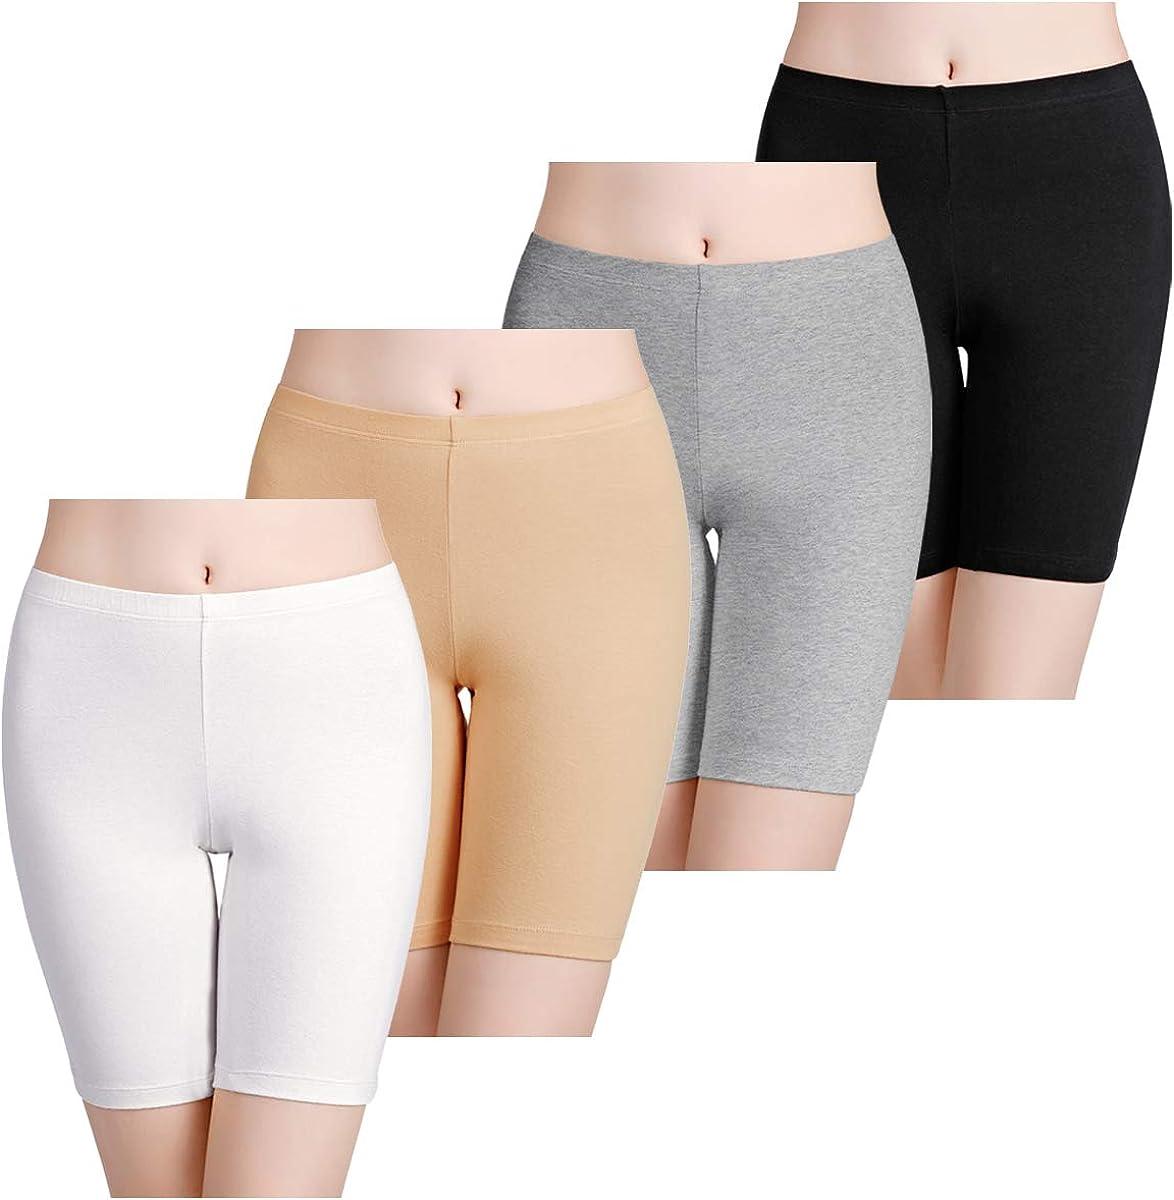 wirarpa Womens Anti Chafing Cotton Undershorts Boy Shorts Bike Boxer Briefs Multipack